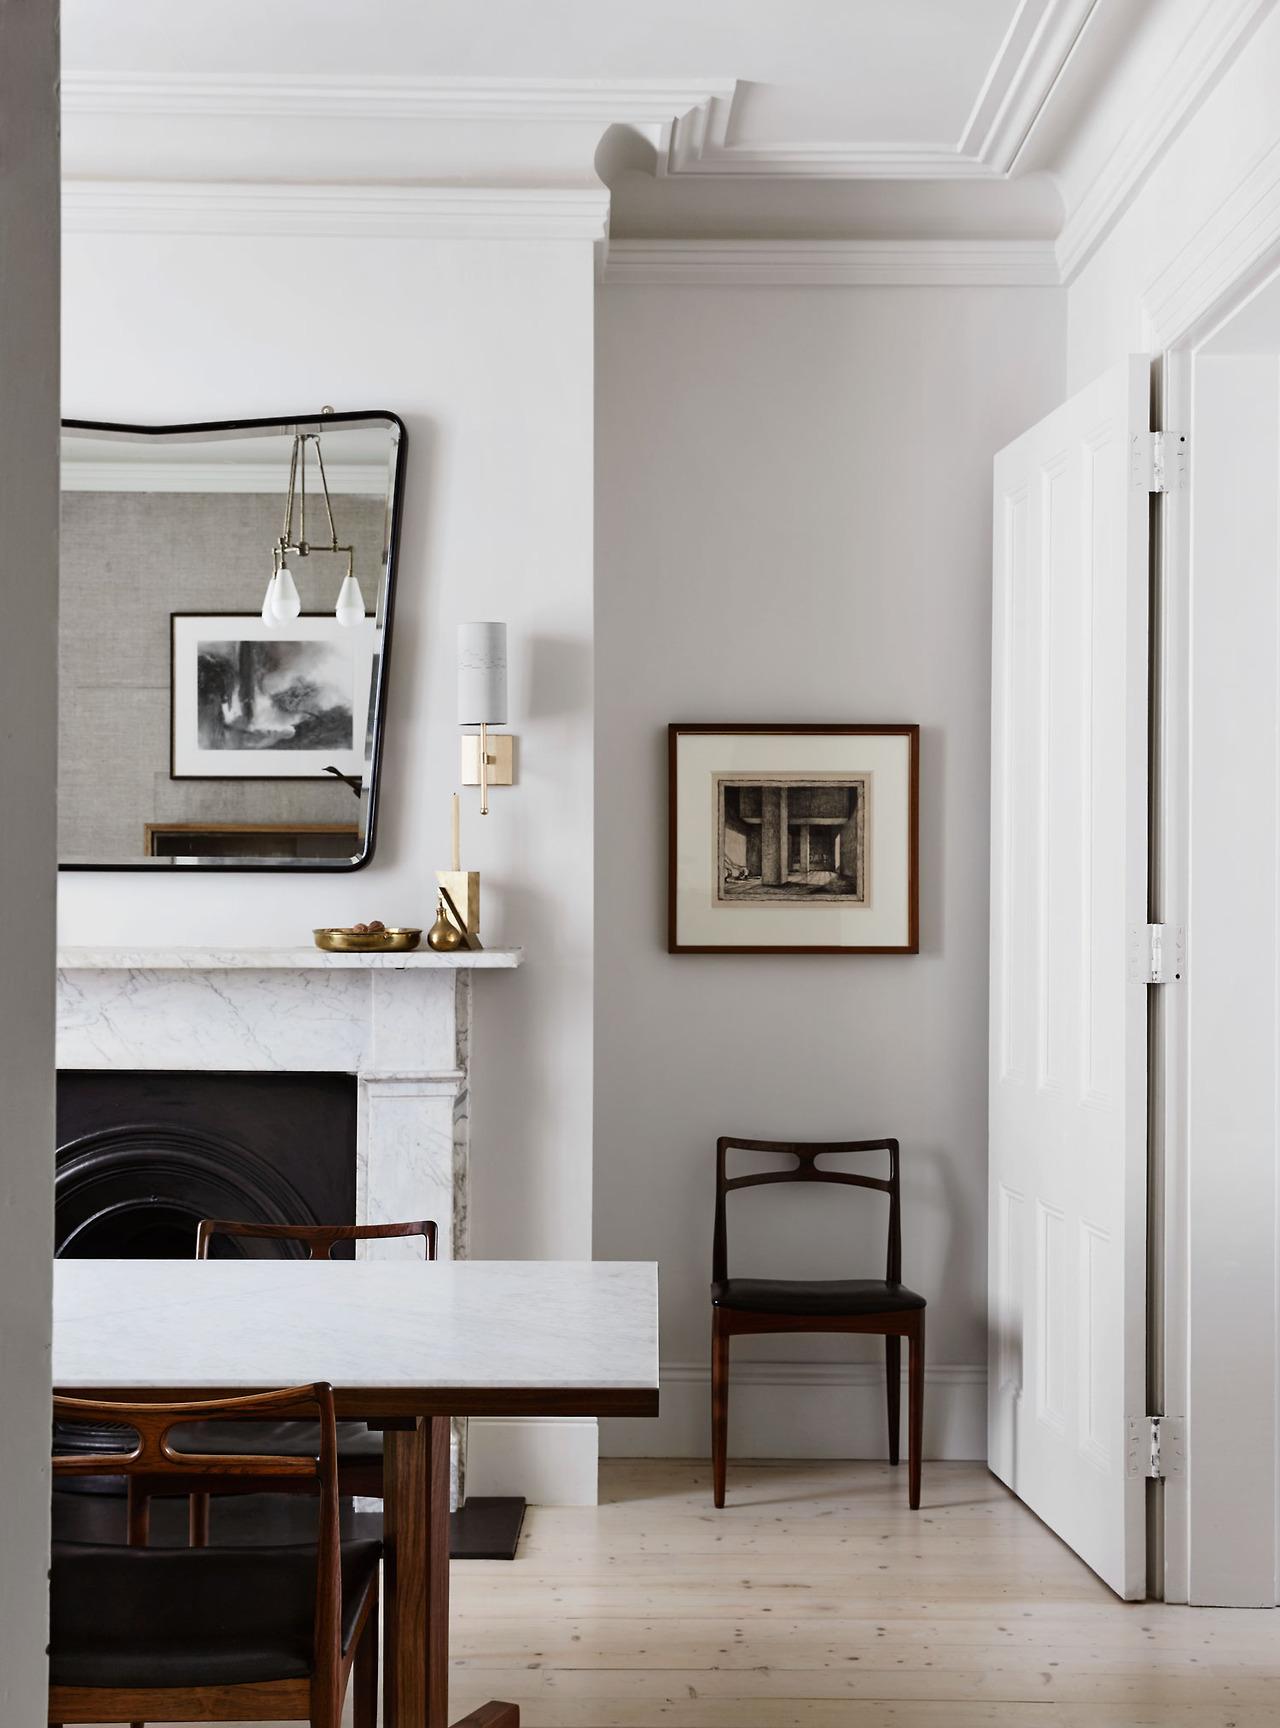 Image credit: Interiors Worldwide